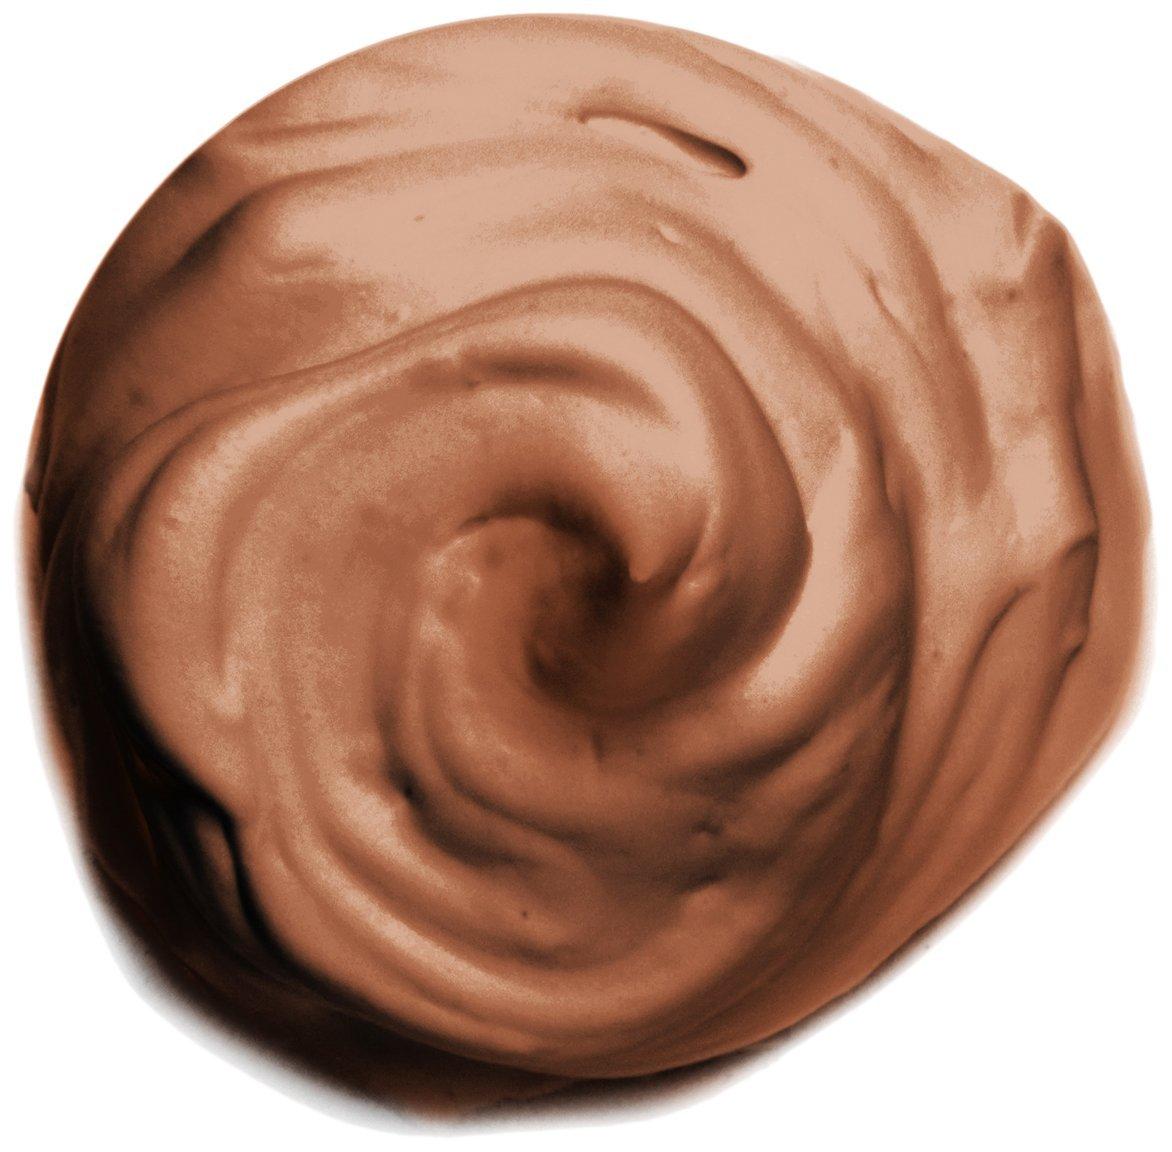 MaybellineDreamNudeAirfoam Foundation - Caramel